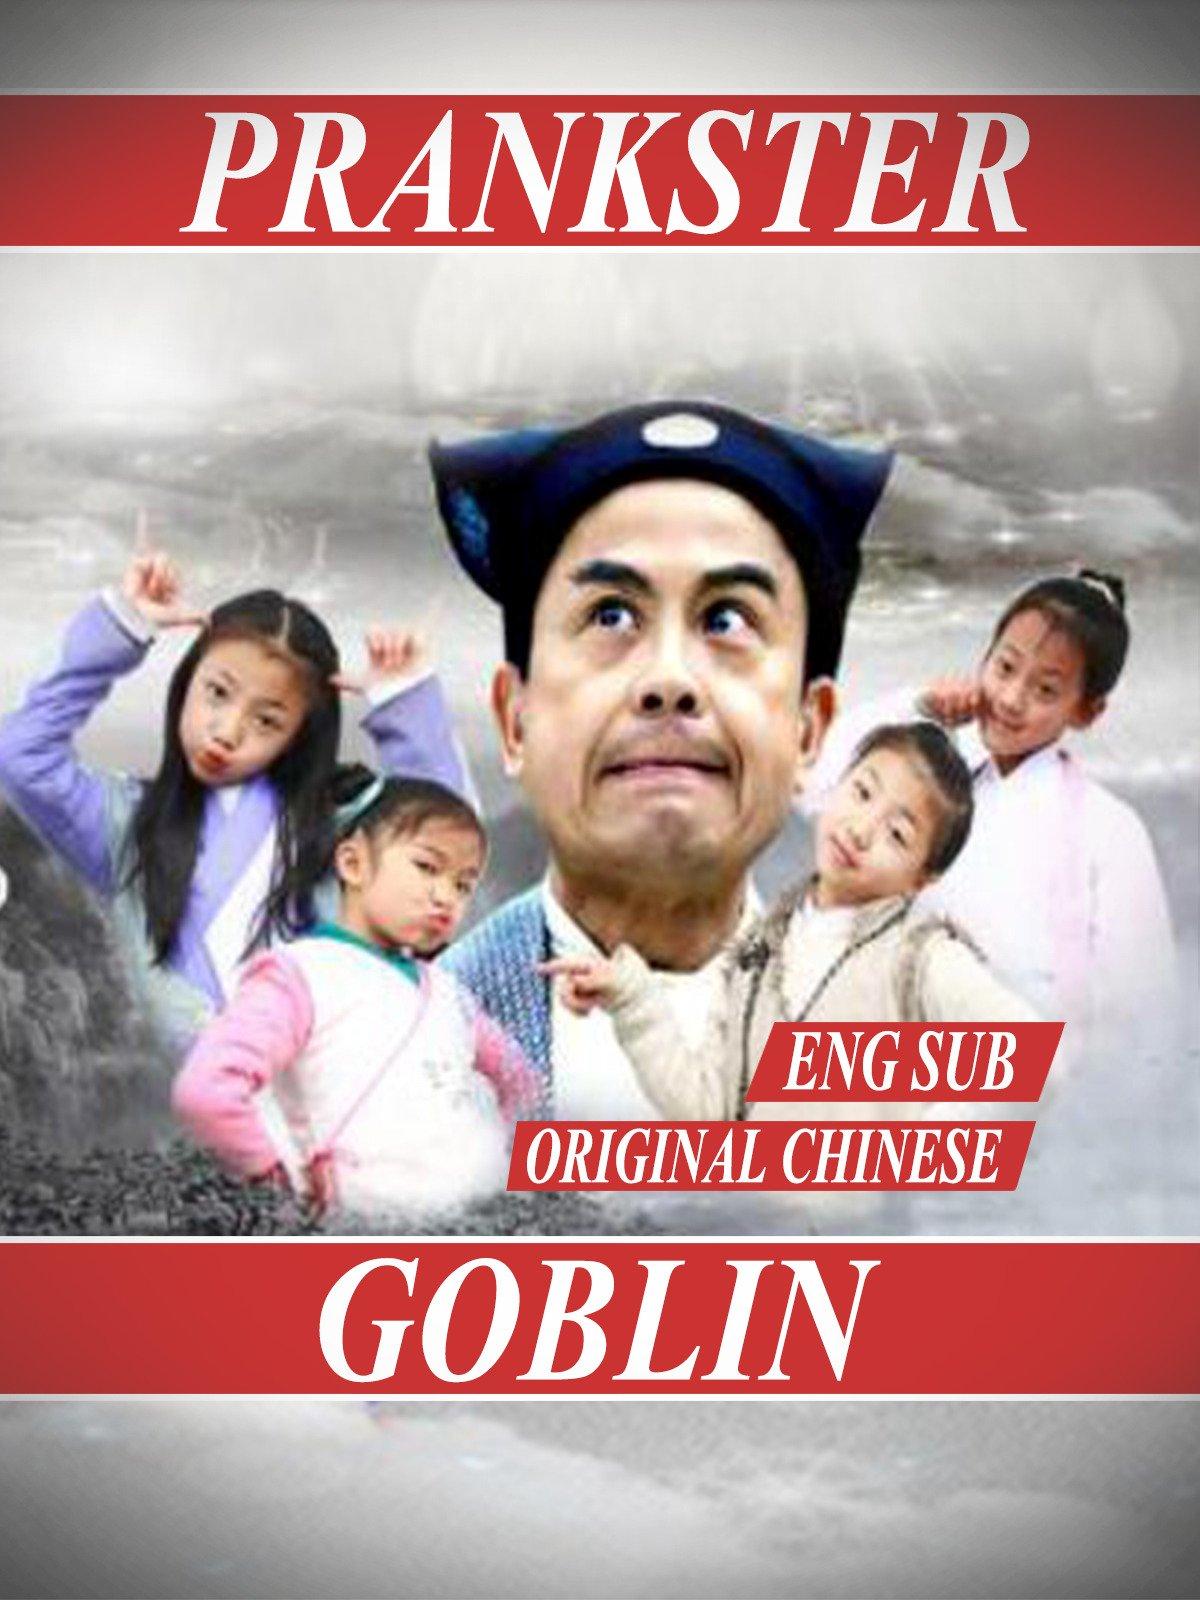 Prankster Goblin [Eng Sub] original Chinese